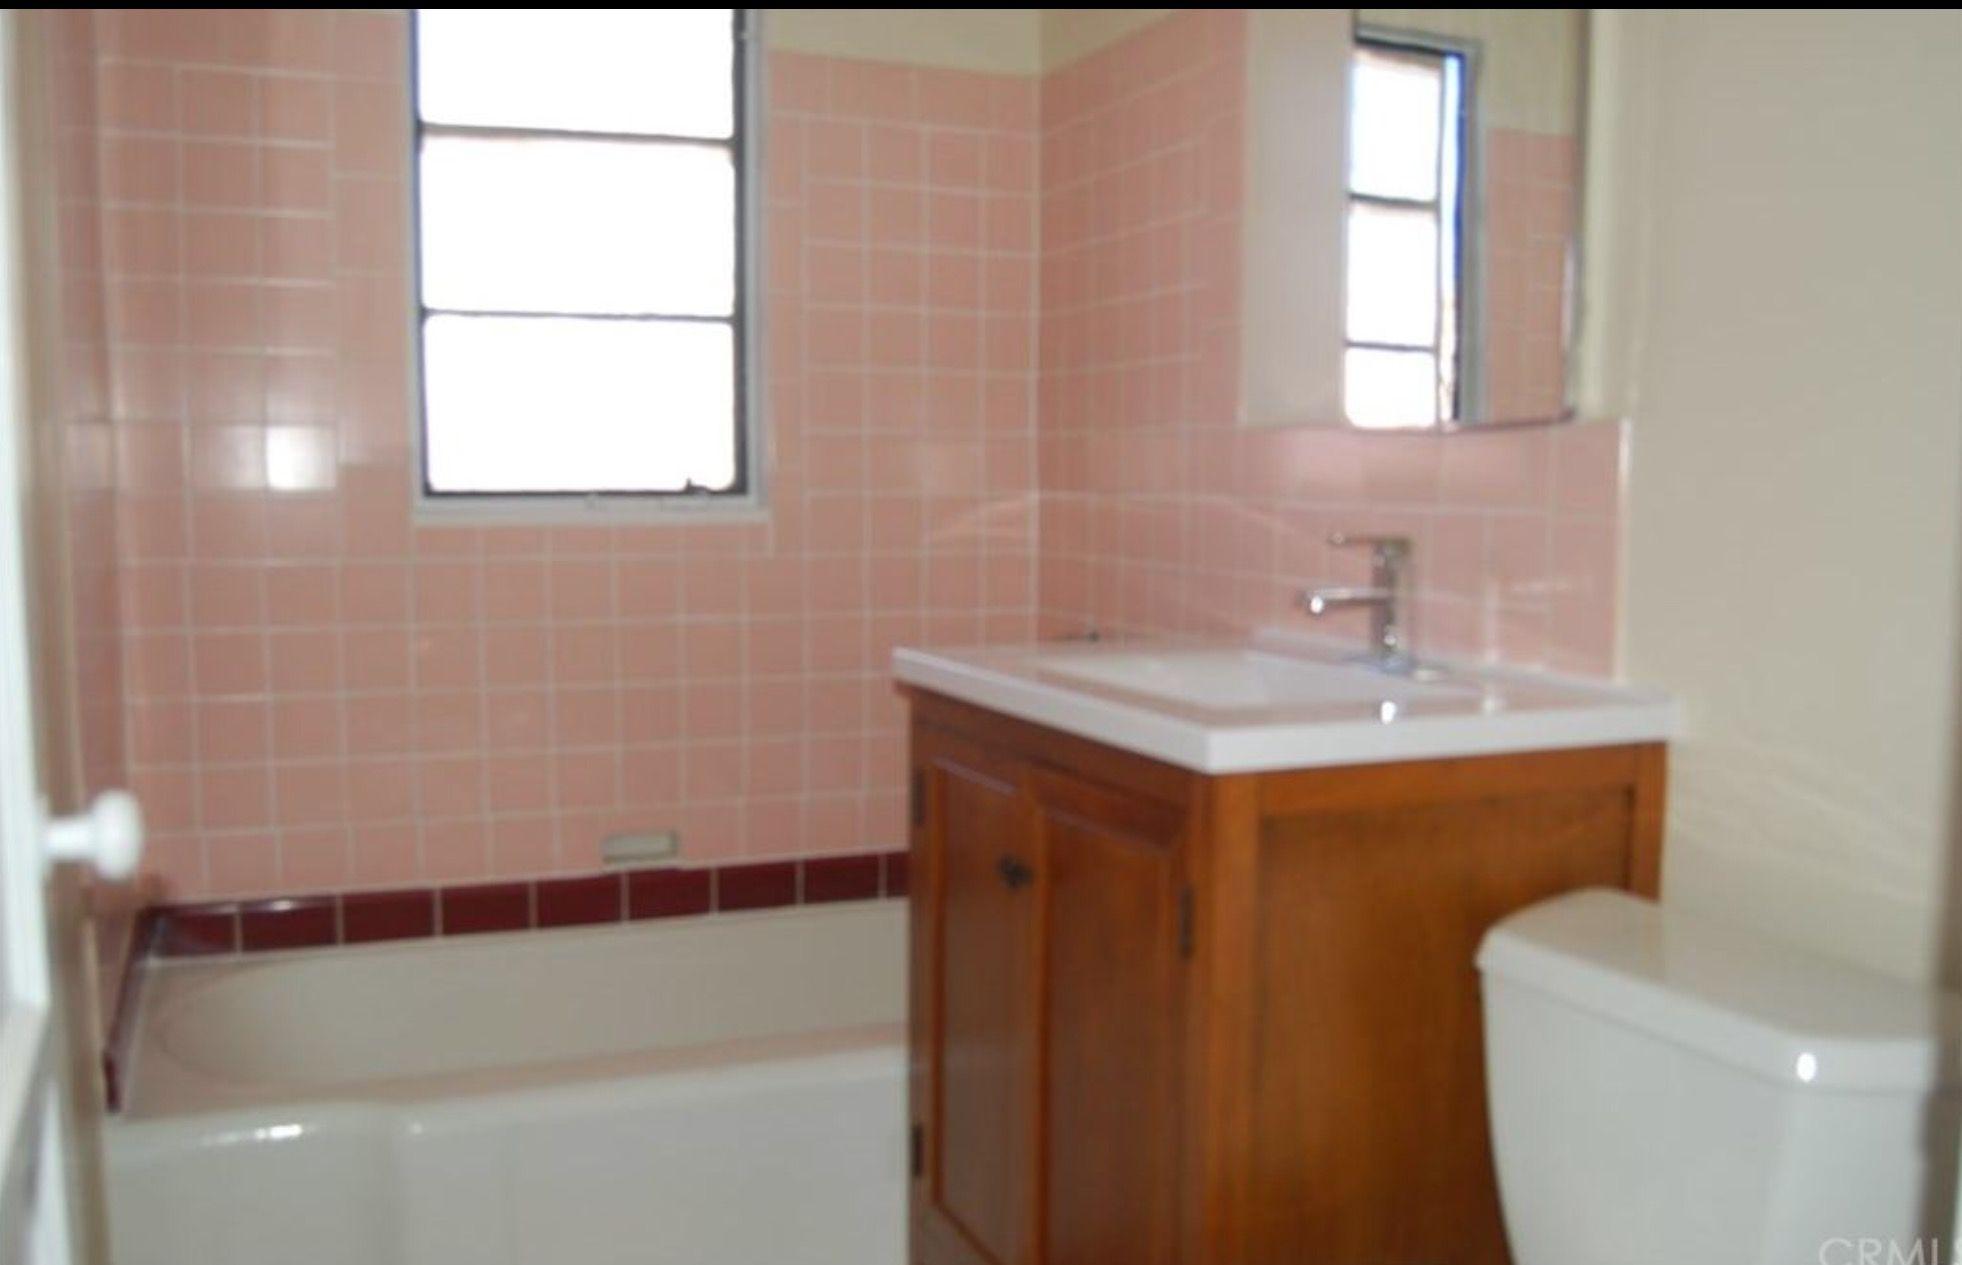 Newer sink but older tub & old style tiles | Vintage Style Bathrooms ...